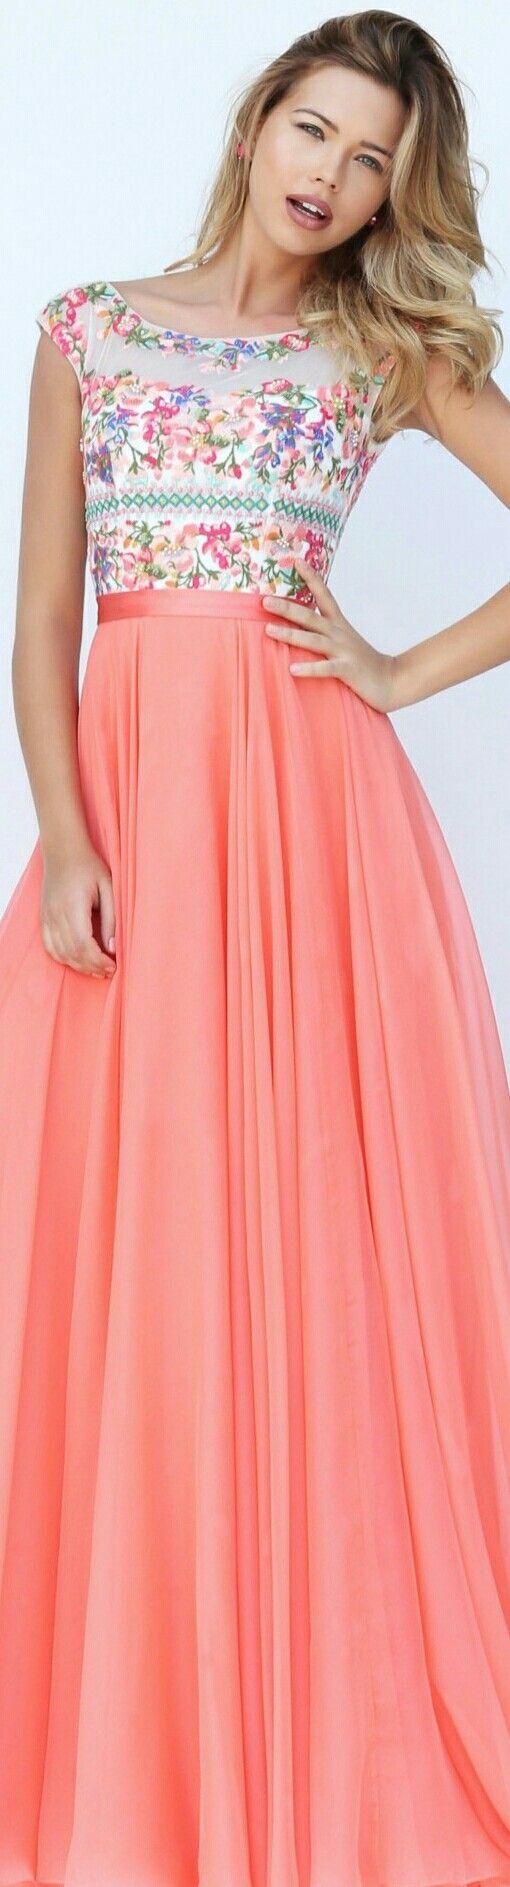 Sherri Hill 50457 | peach | peach by Cynthia fondren | Pinterest ...